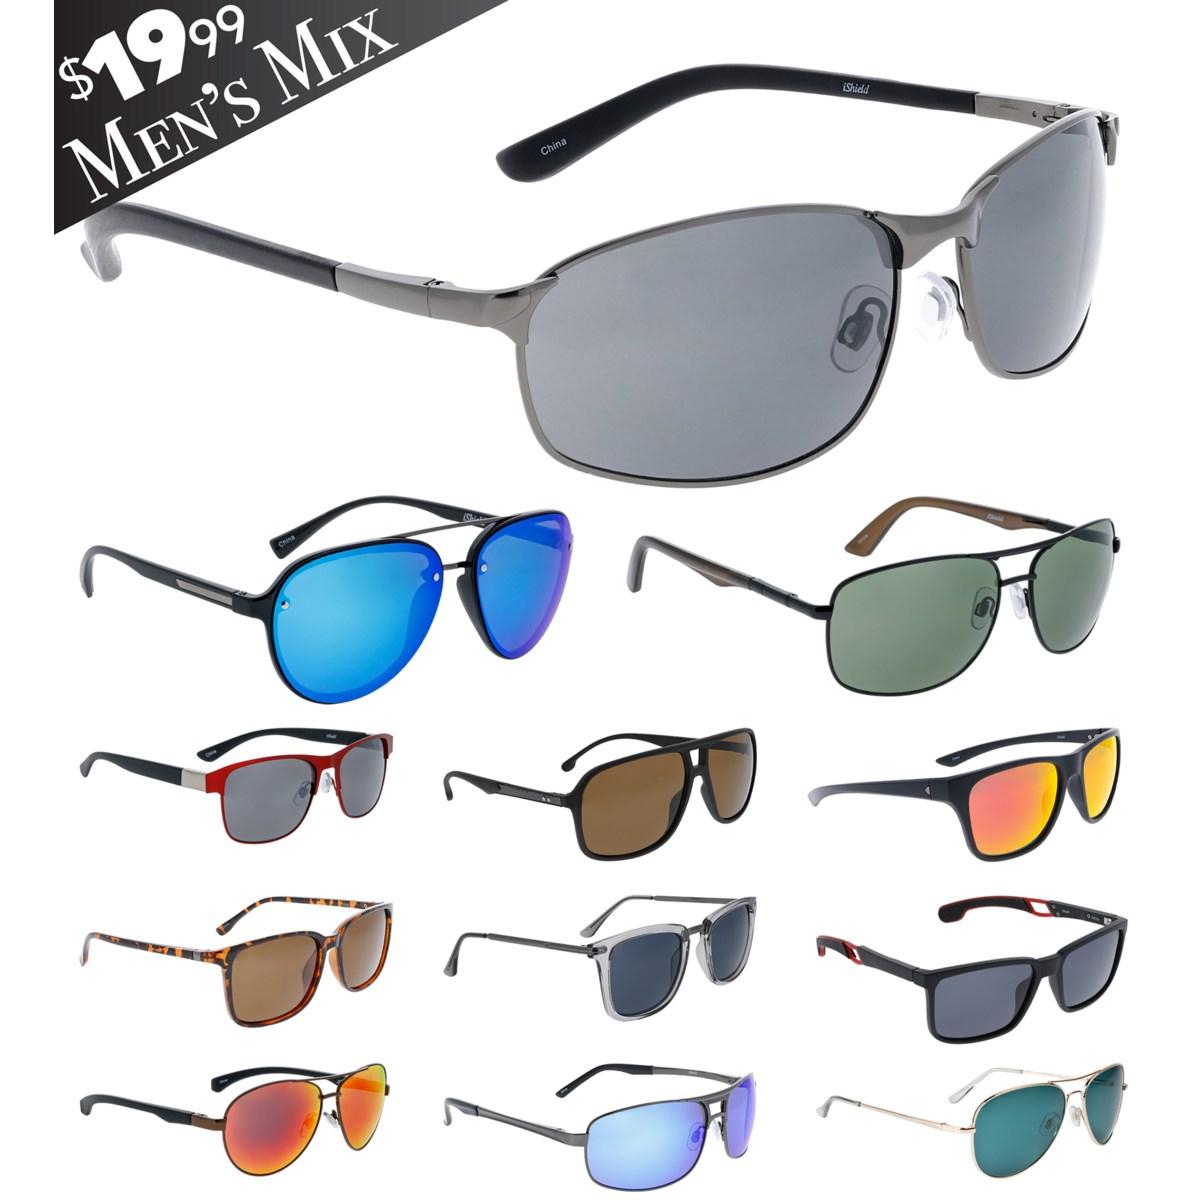 iShield Black Tag Sunglasses Men's Mix